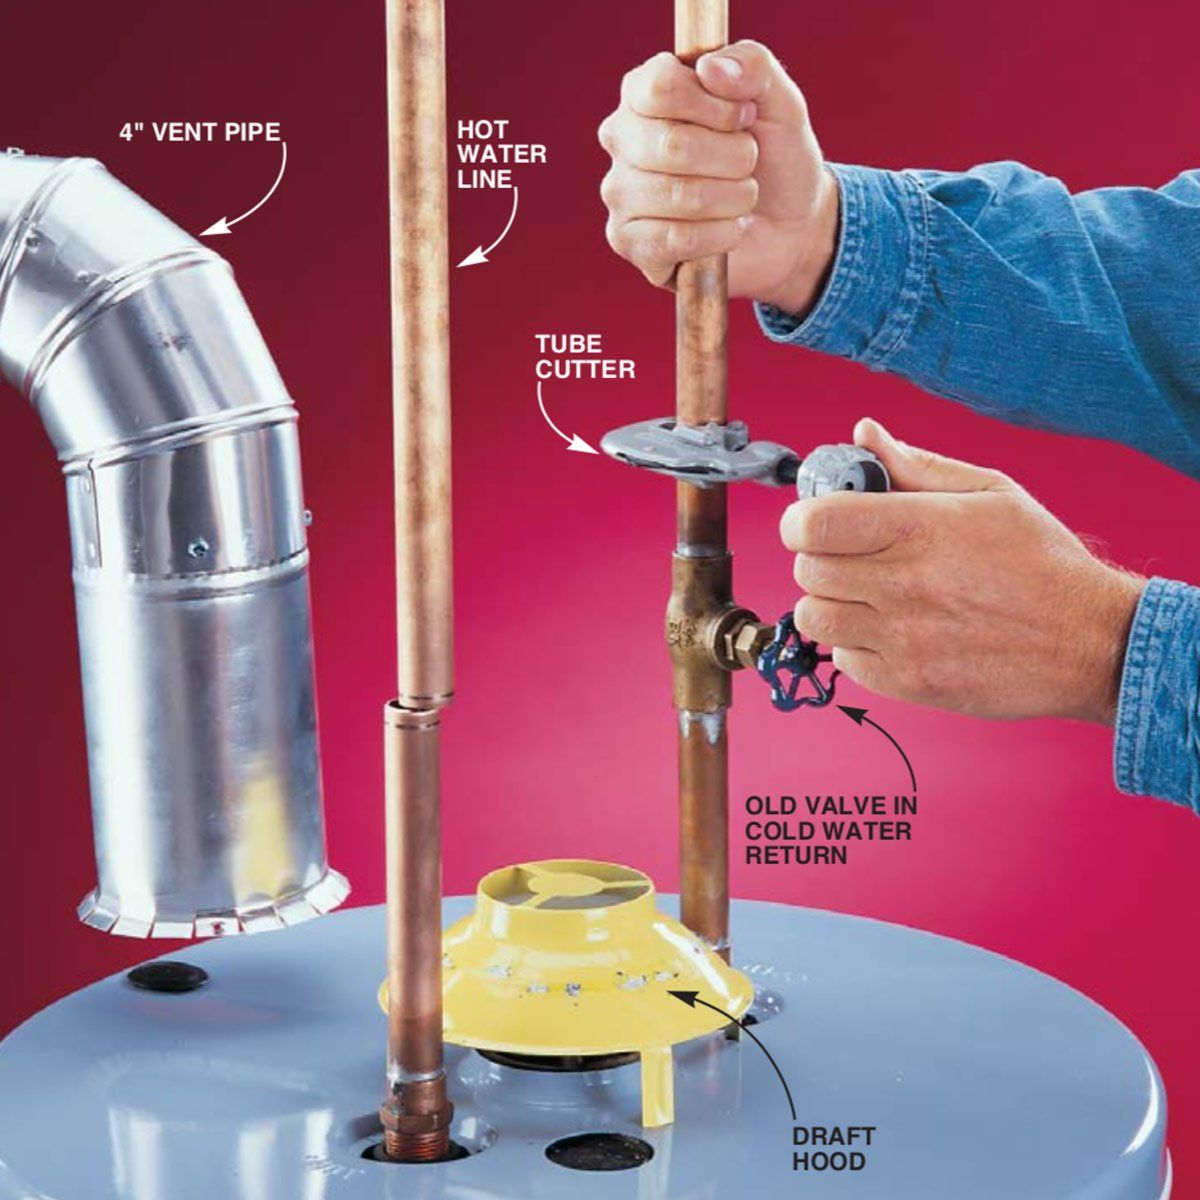 Diy Water Heater Installation In 2020 Water Heater Installation Solar Panel Installation Water Heater